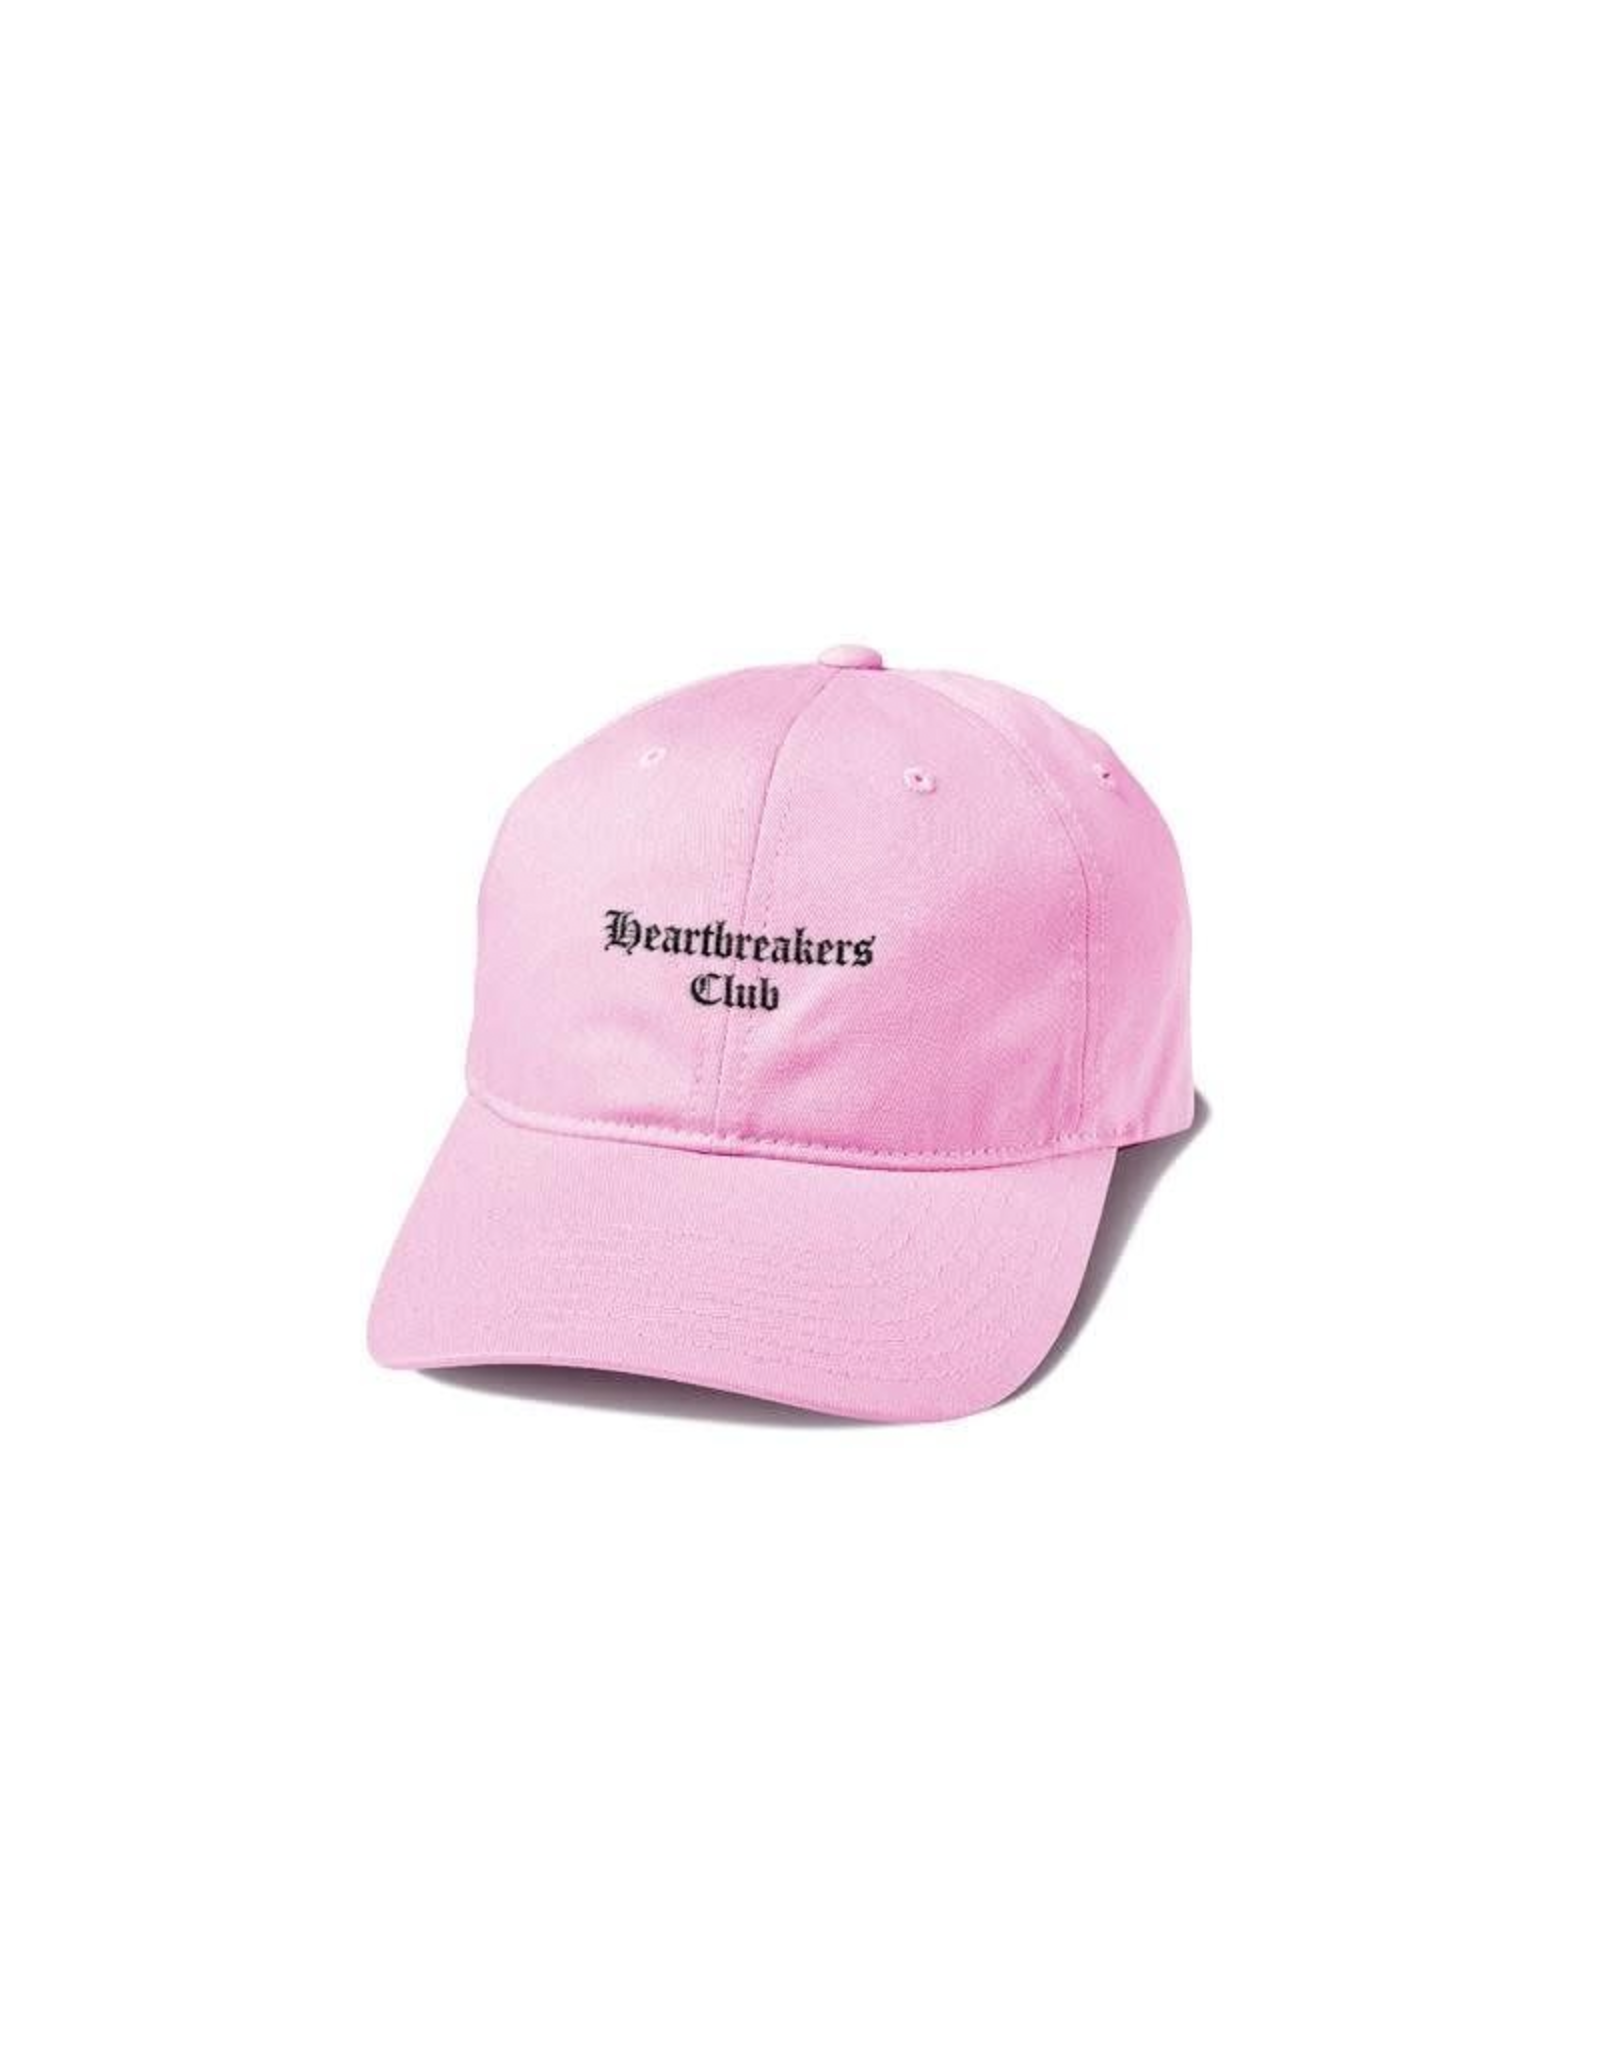 Primitive Heartbreakers Club Hat